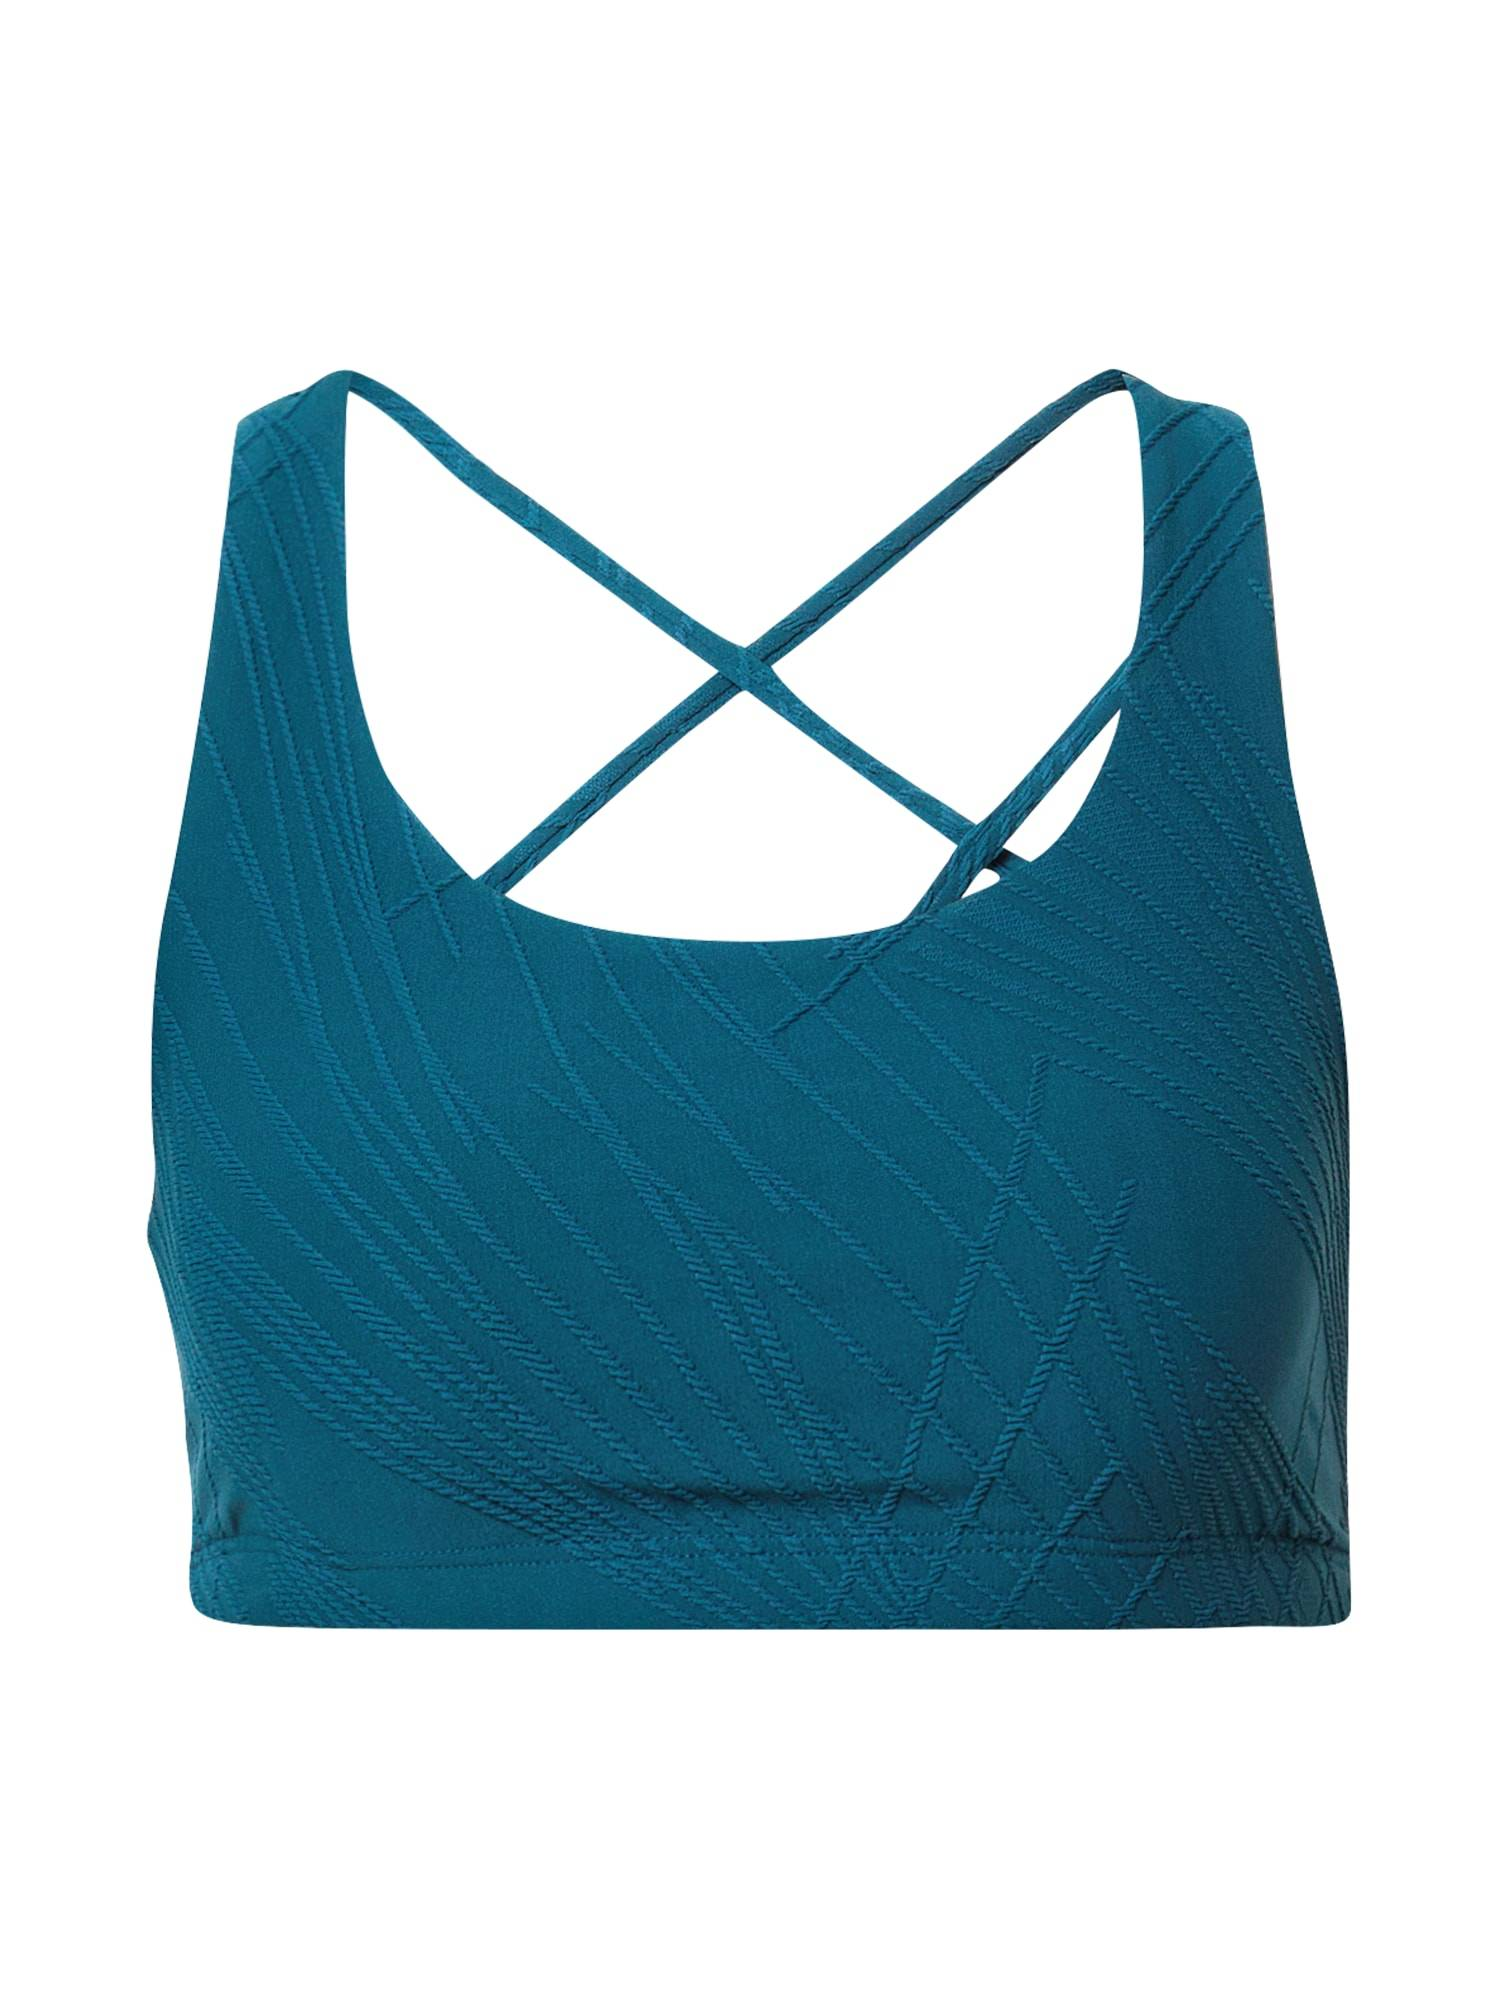 Onzie Soutien-gorge de sport 'Selenite Mudra'  - Bleu - Taille: M-L - female